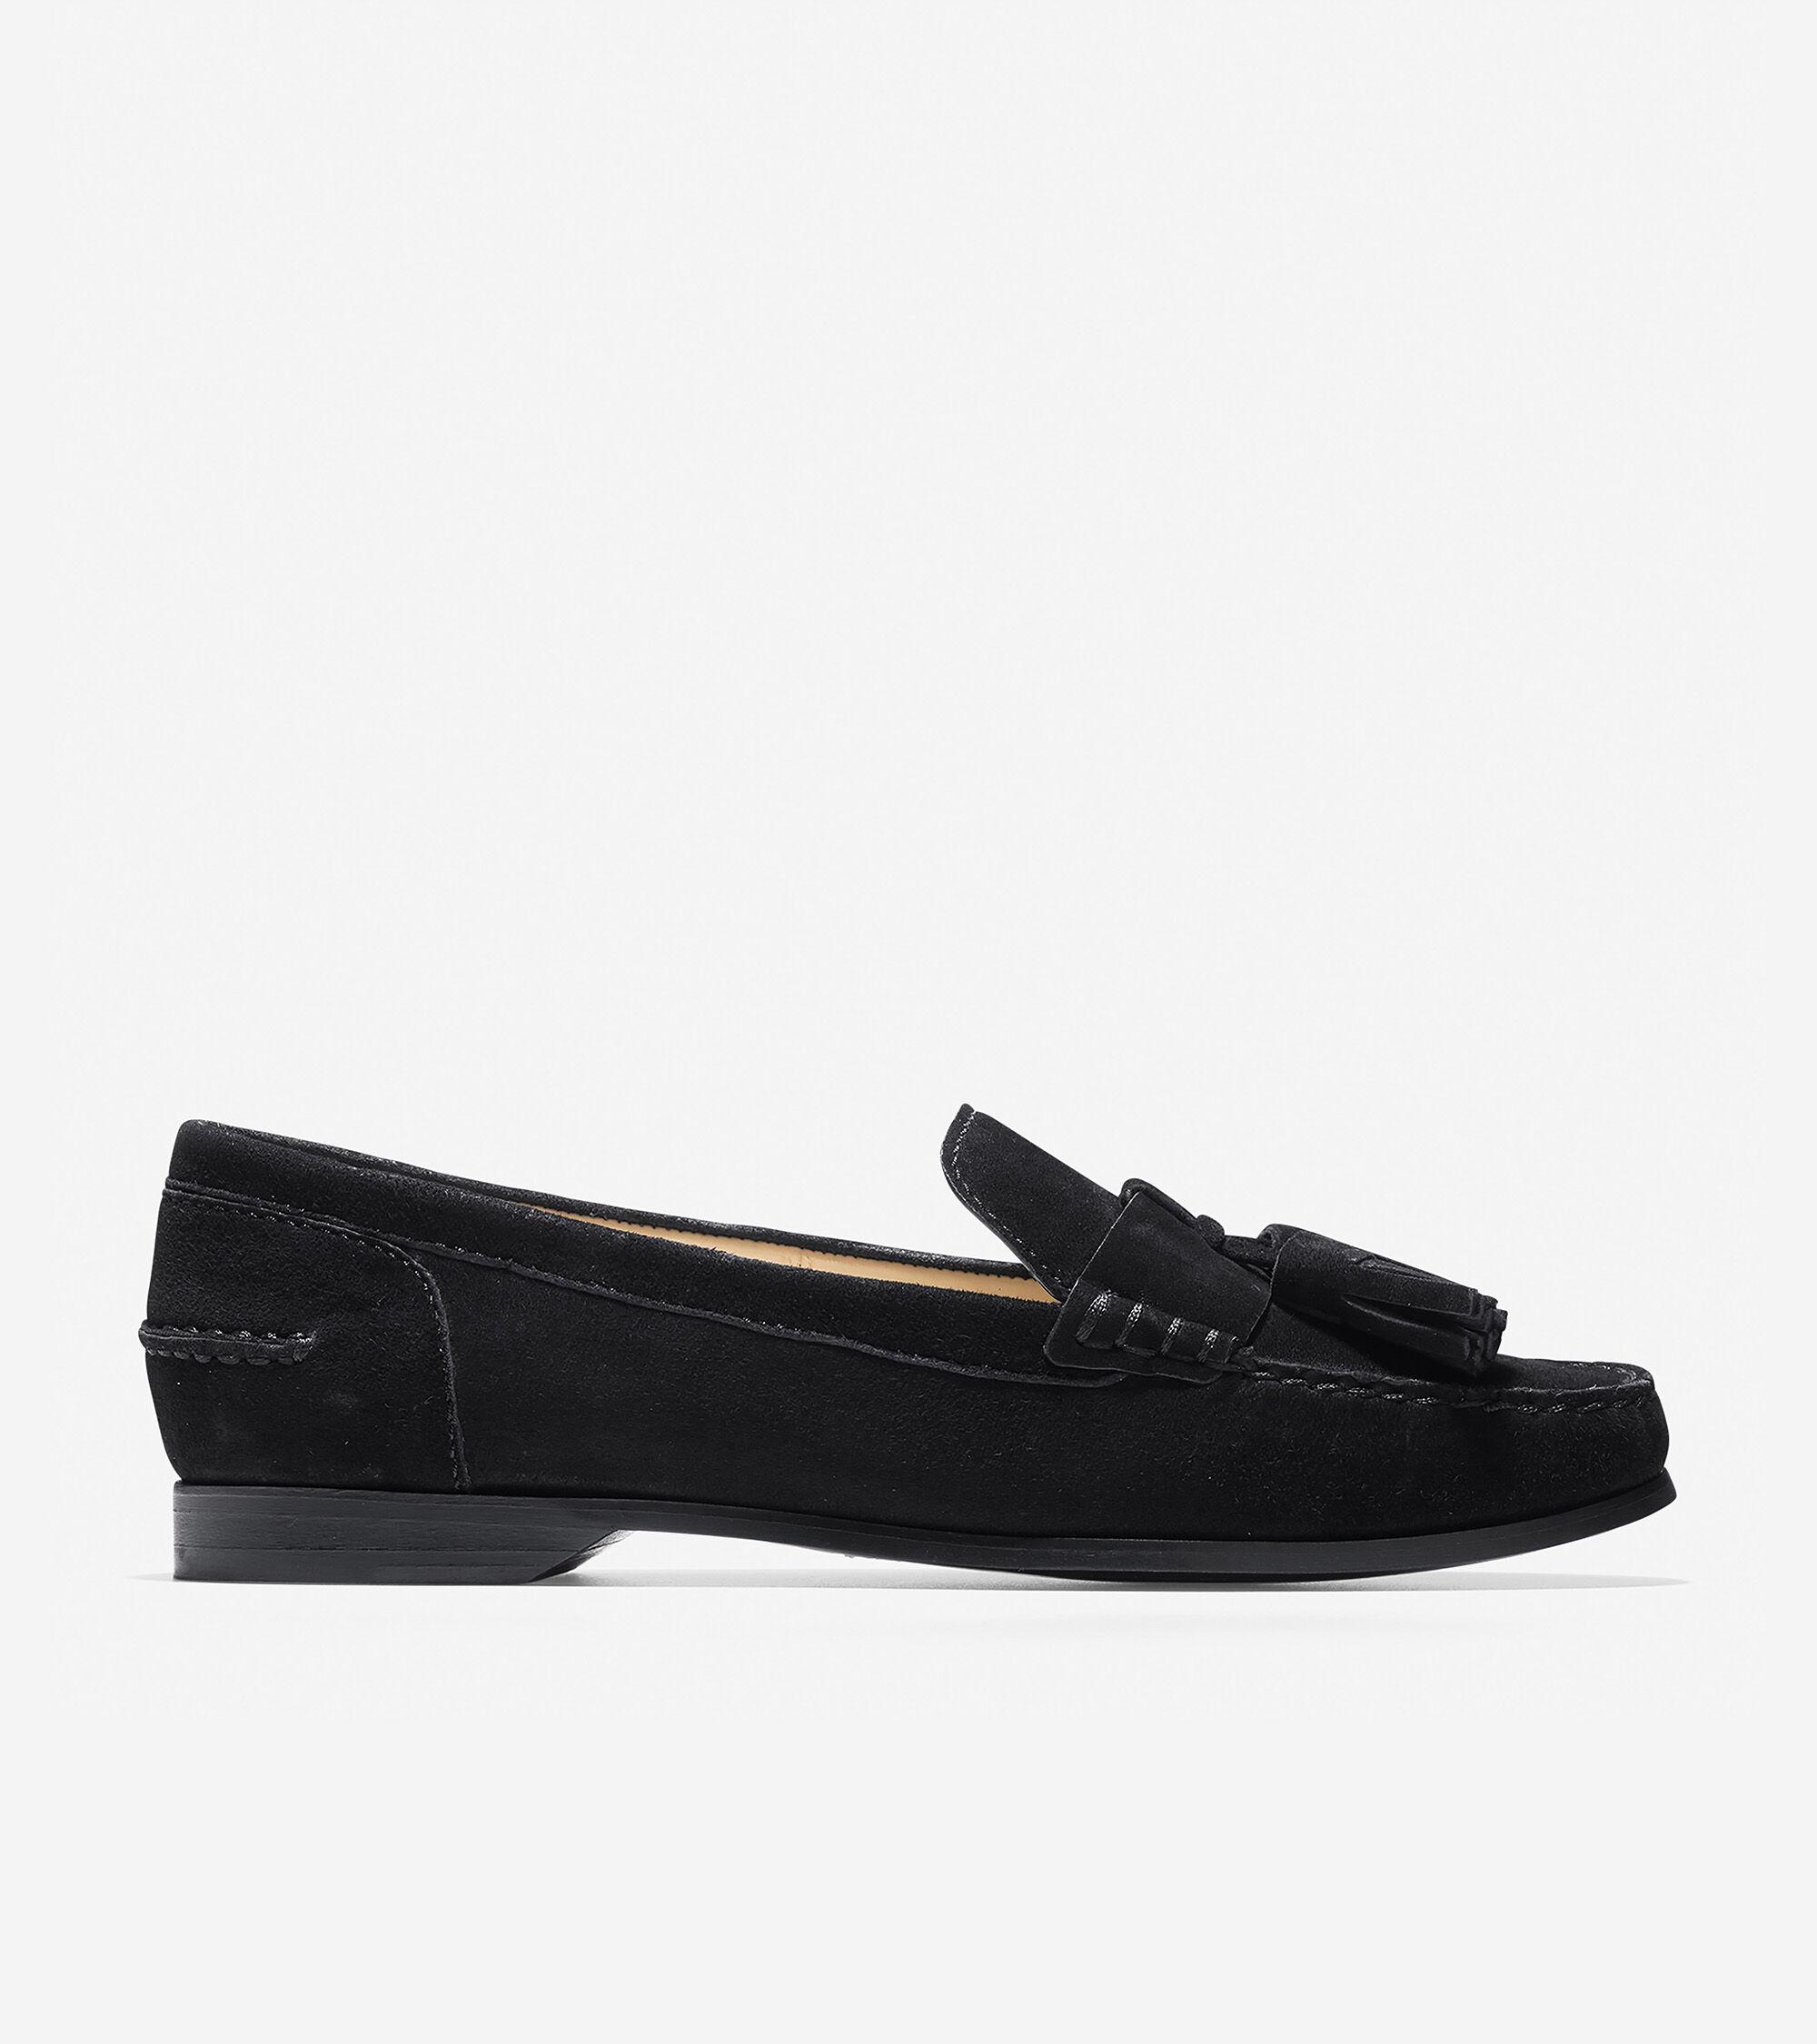 Emmons Tassel Loafer in Black Suede